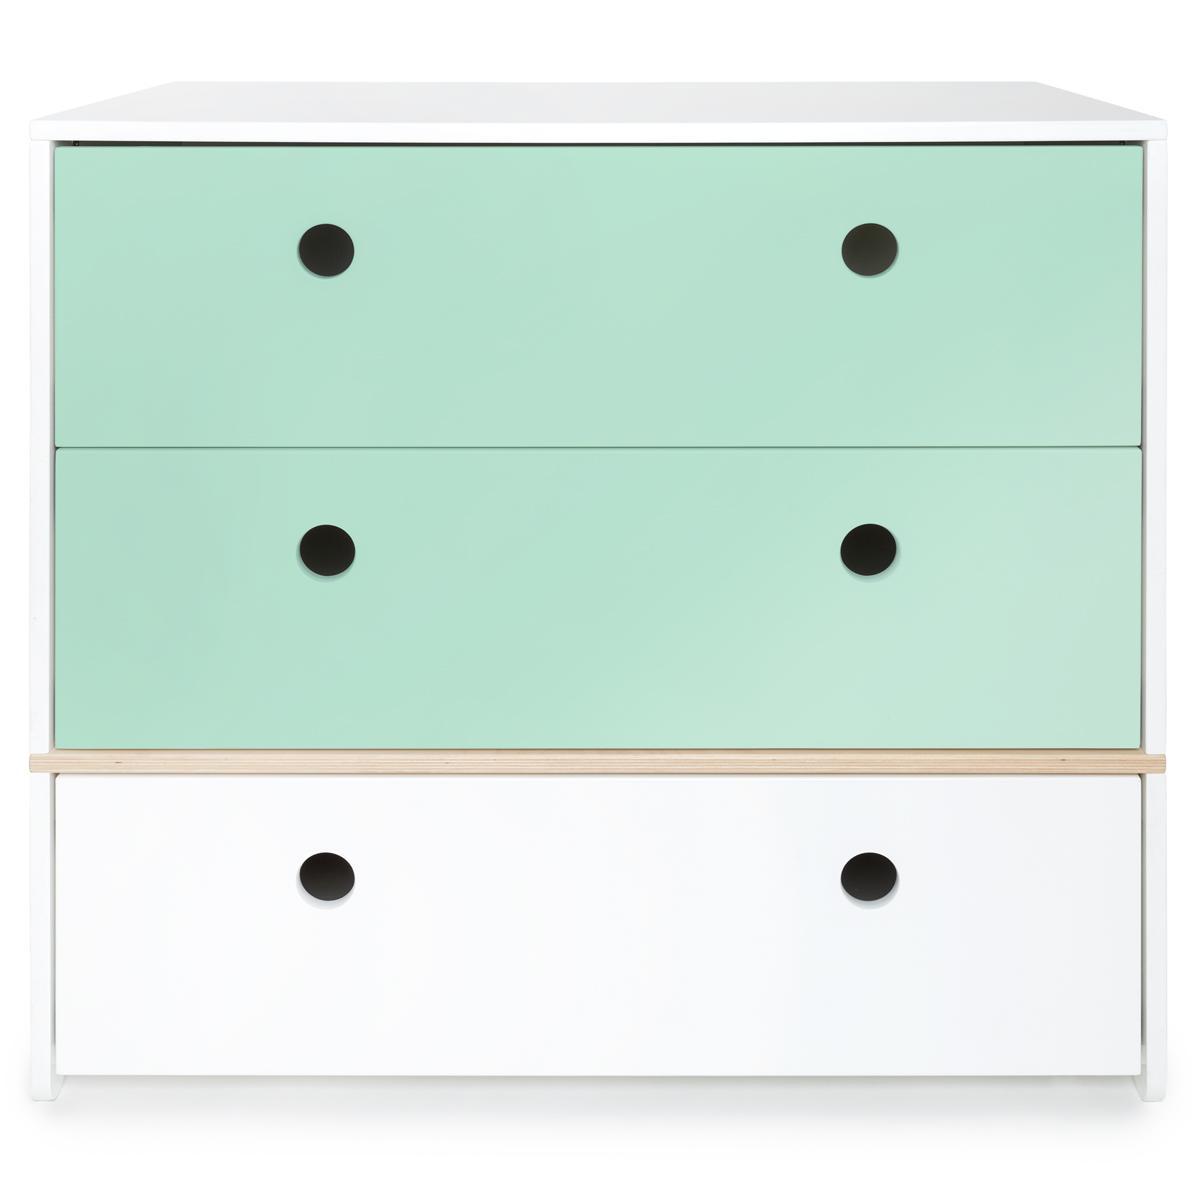 Kommode COLORFLEX Schubladen Farben mint-mint-white